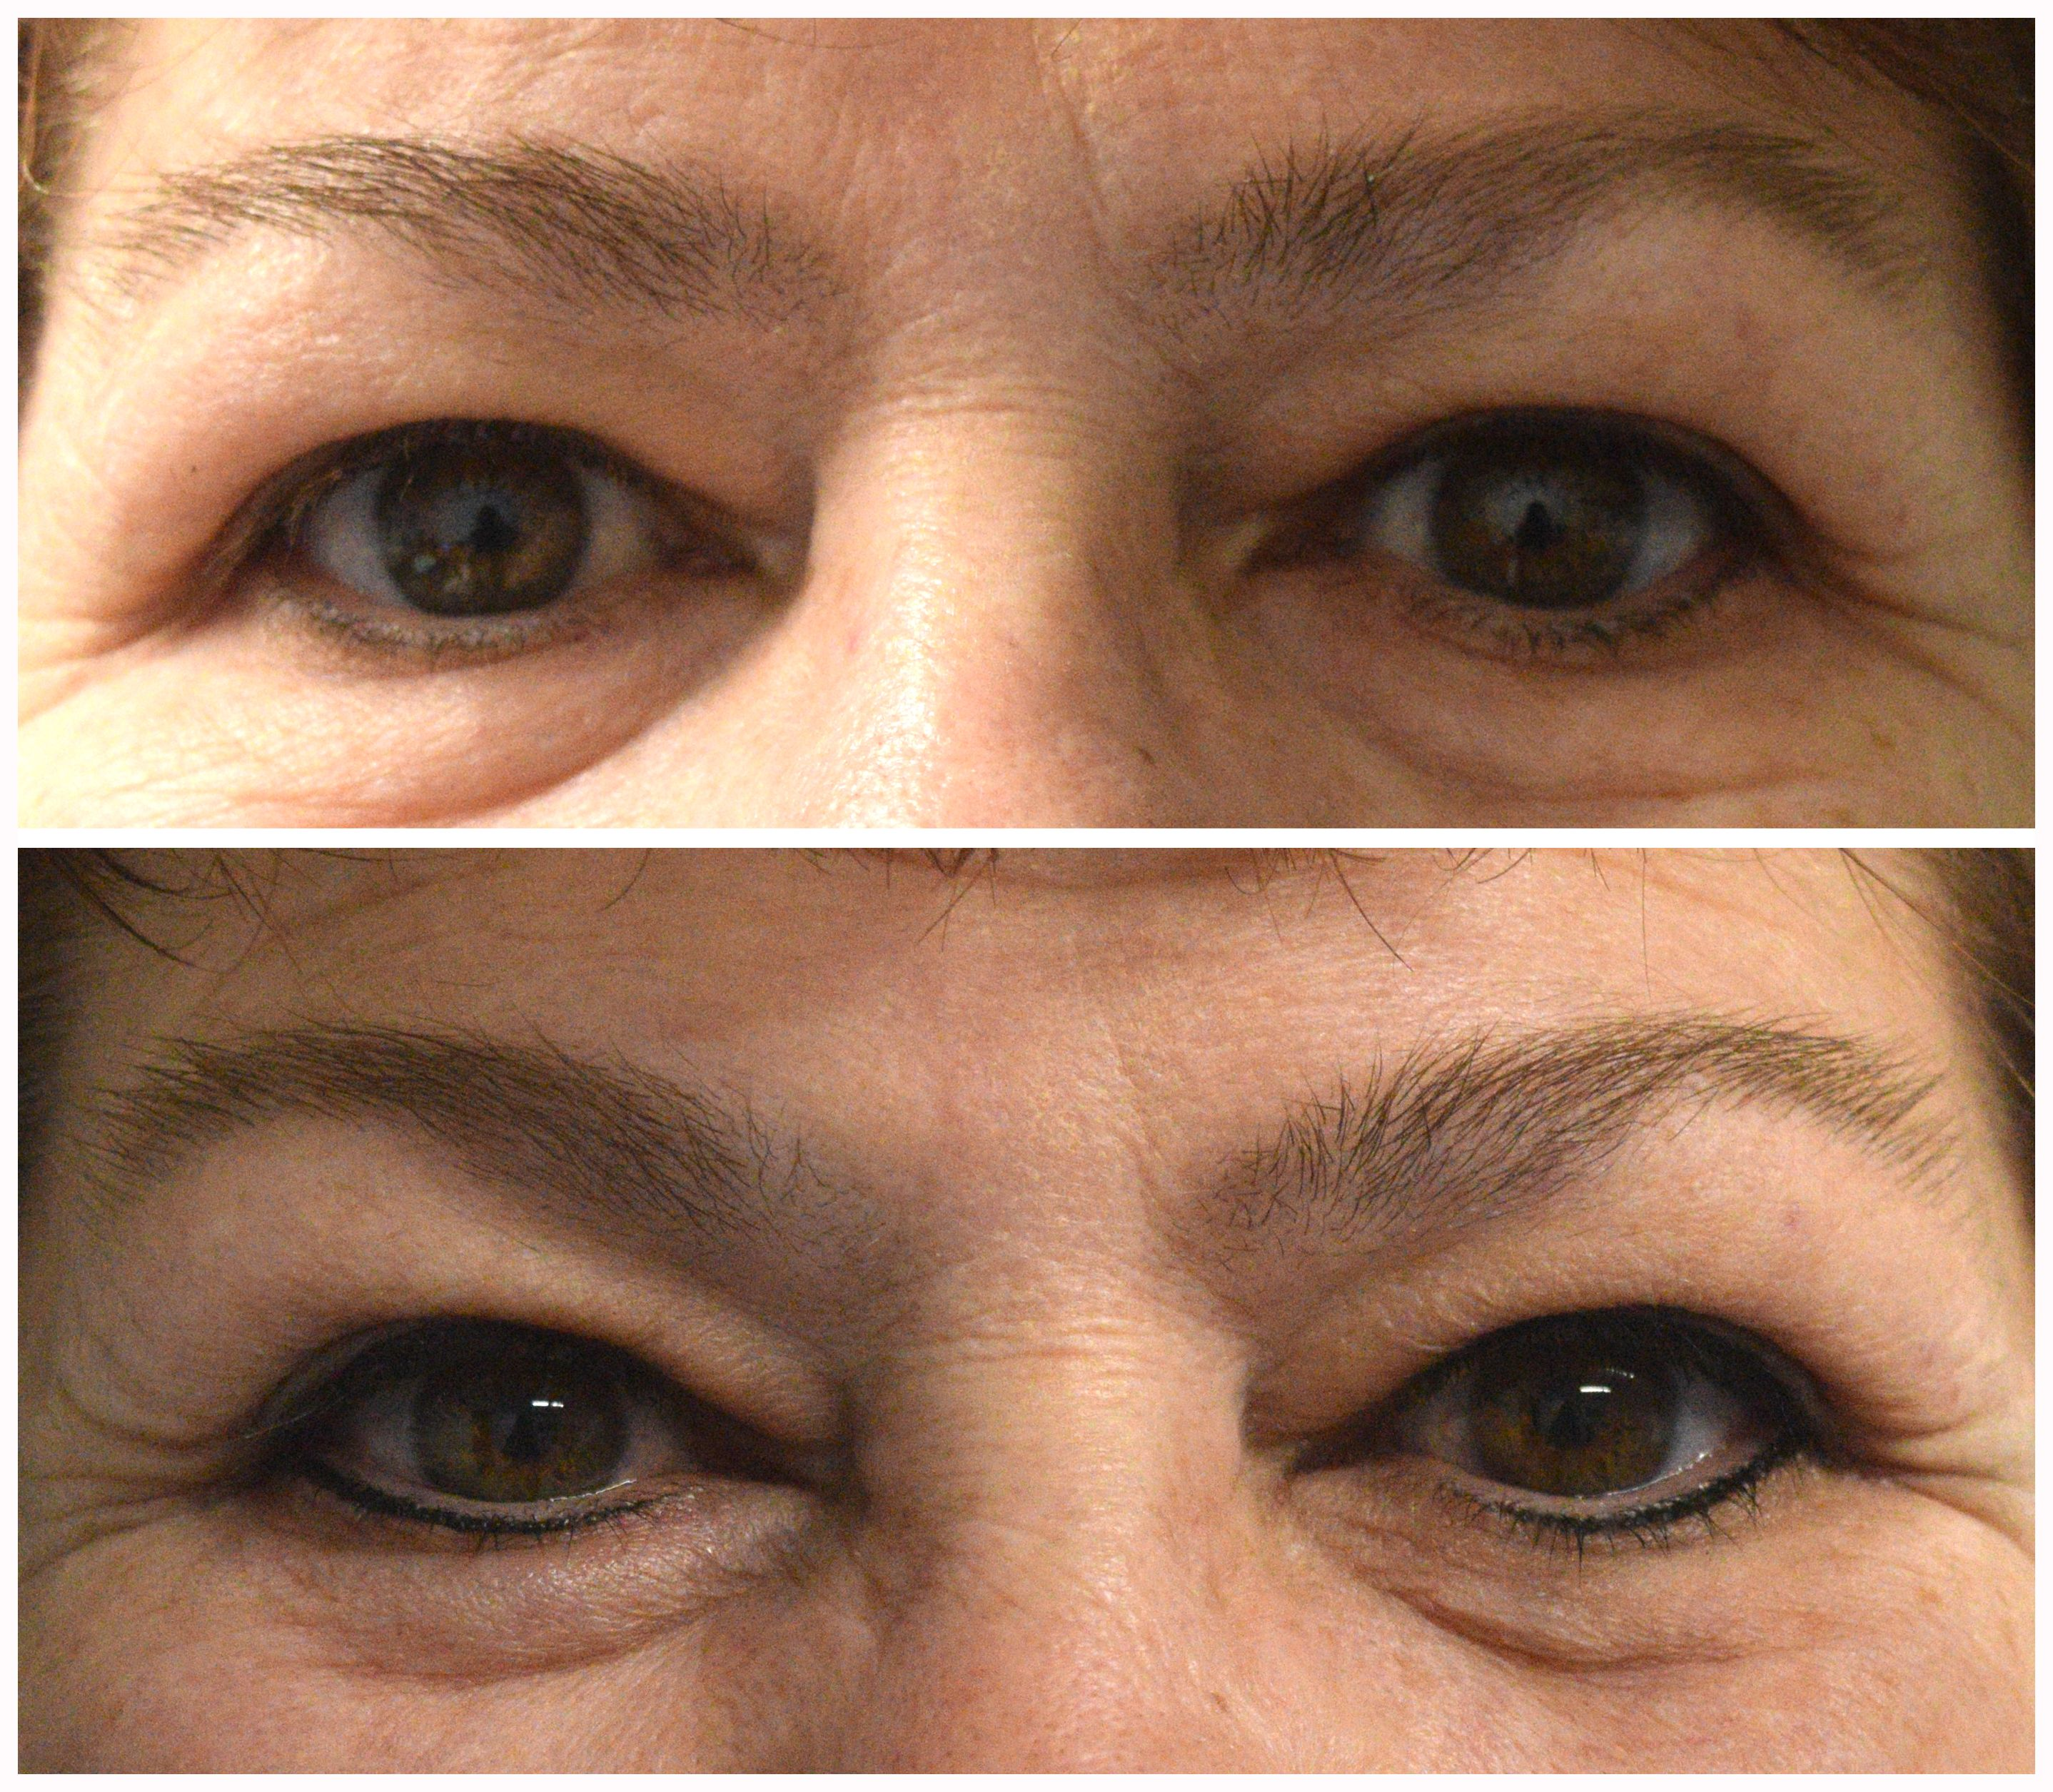 Upper & Lower SemiPermanent Eyeliner Cosmetic solution